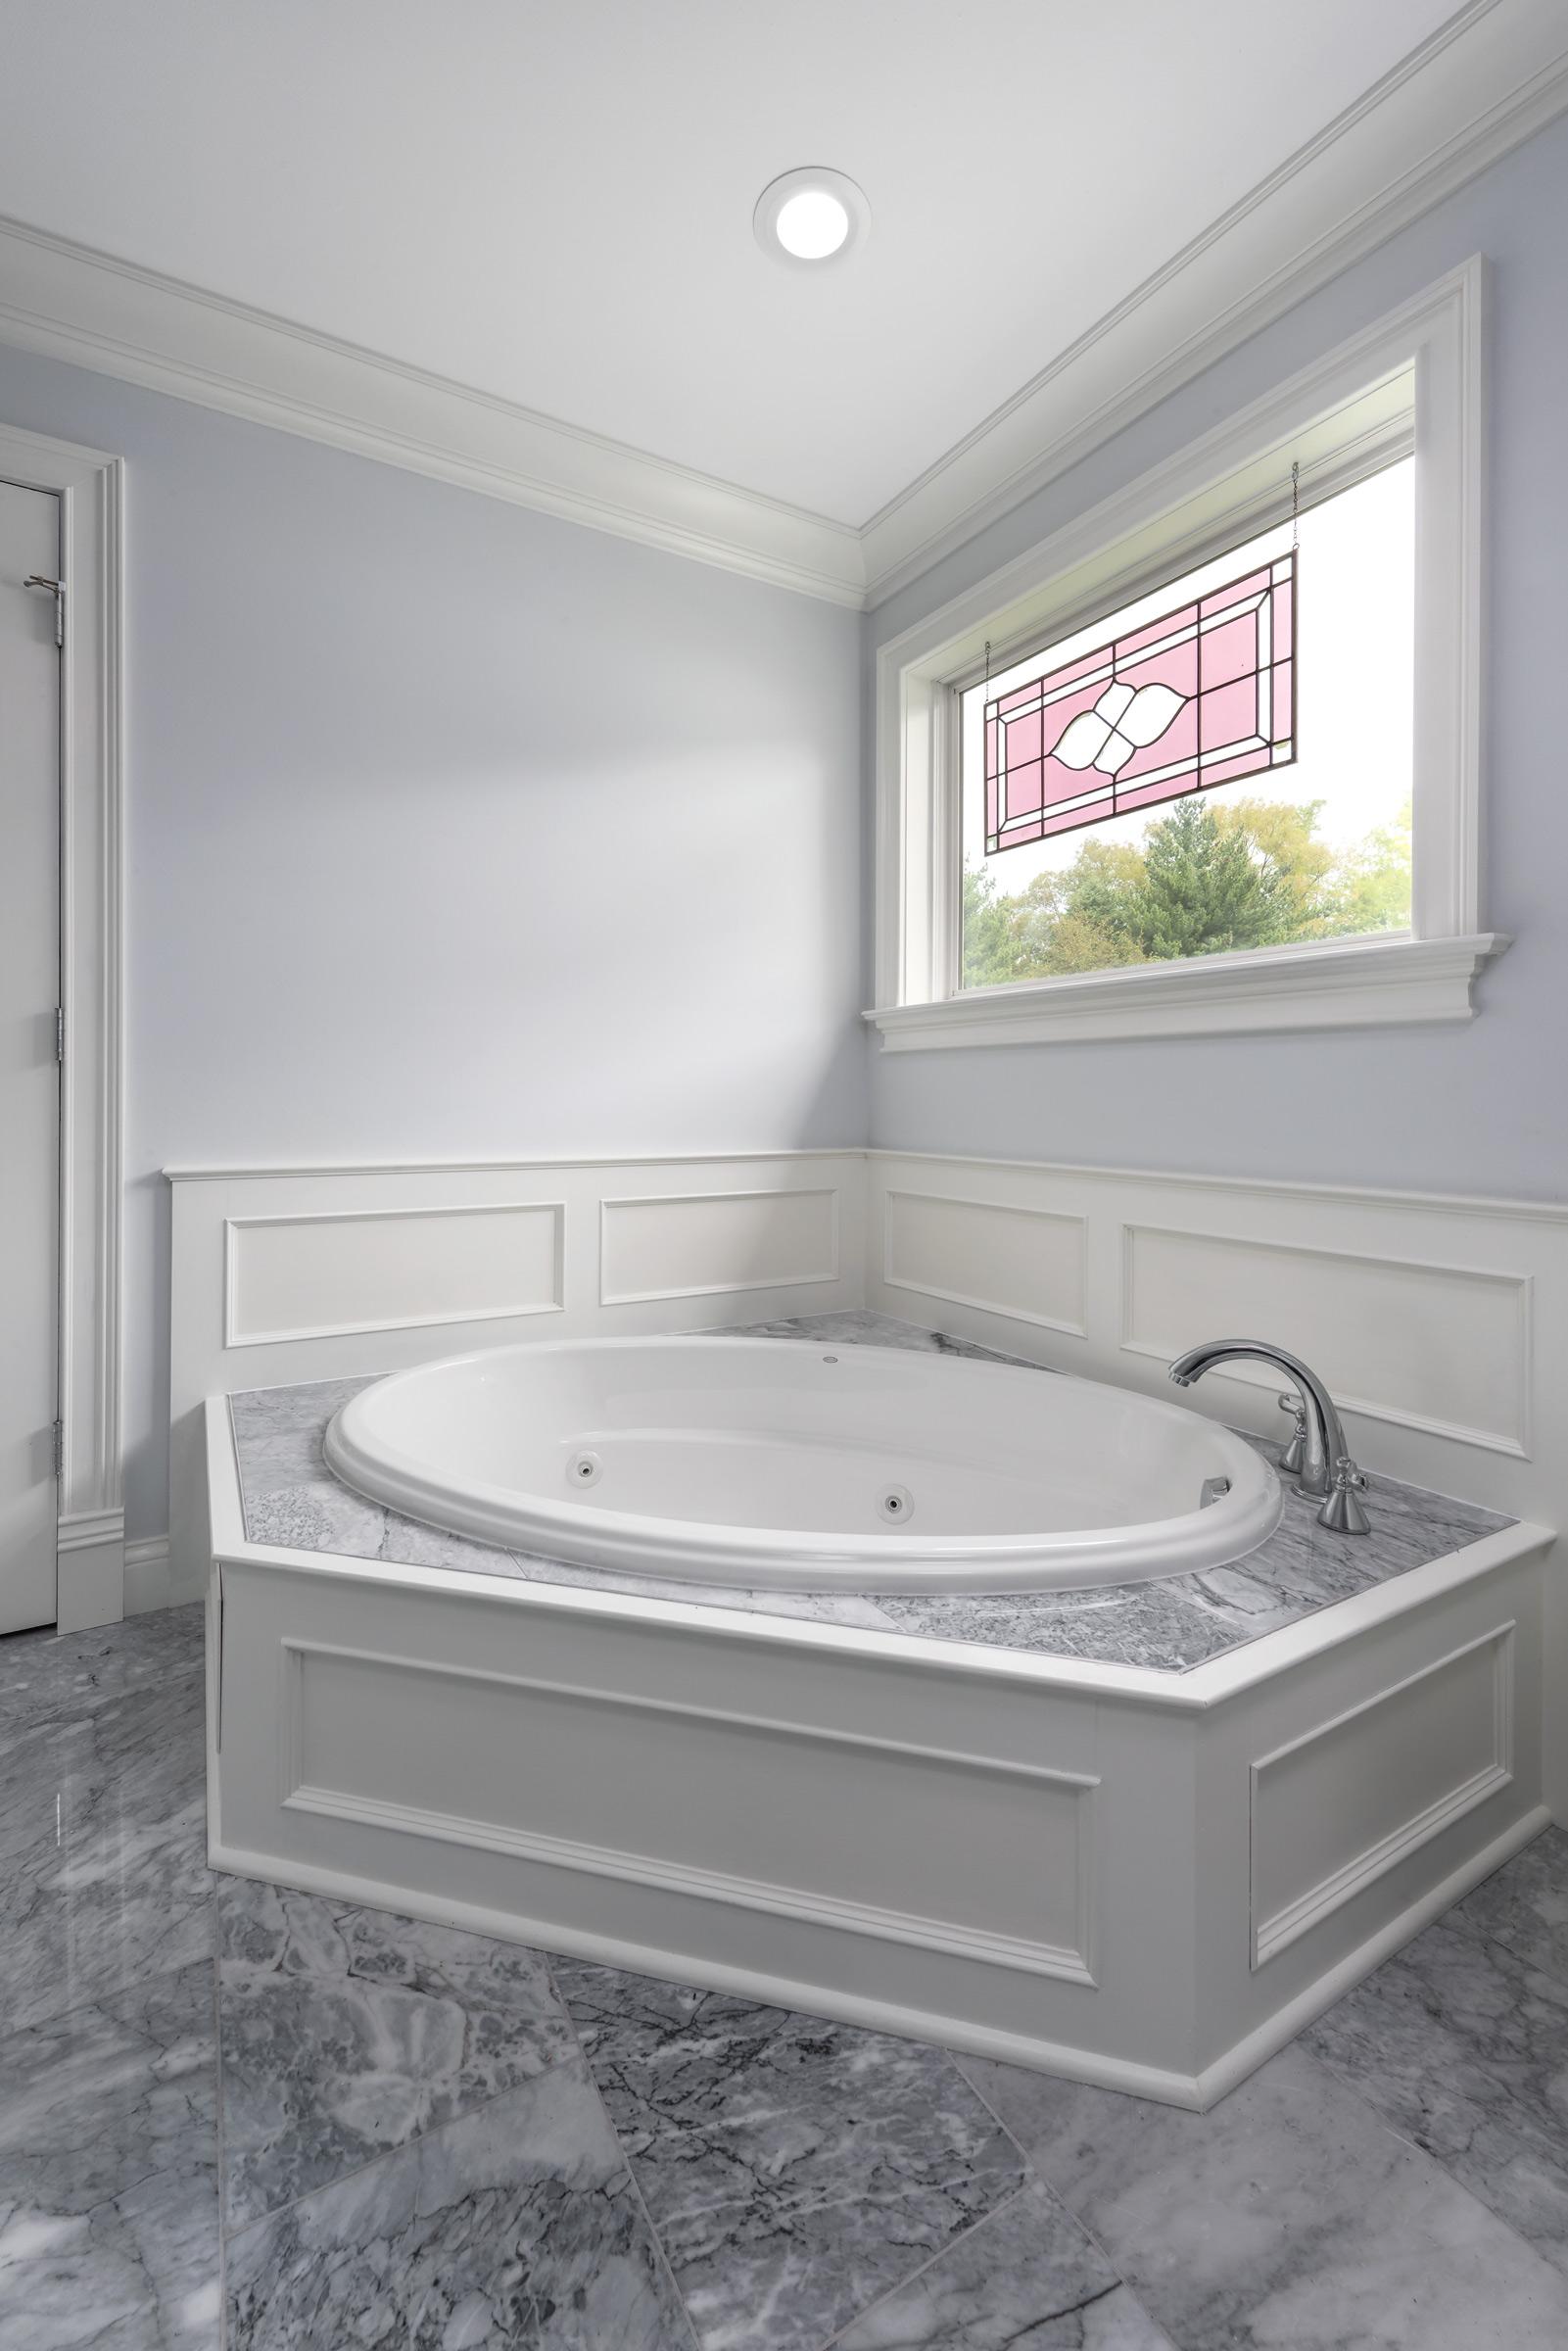 Wood Paneling and marble tile bathtub ba